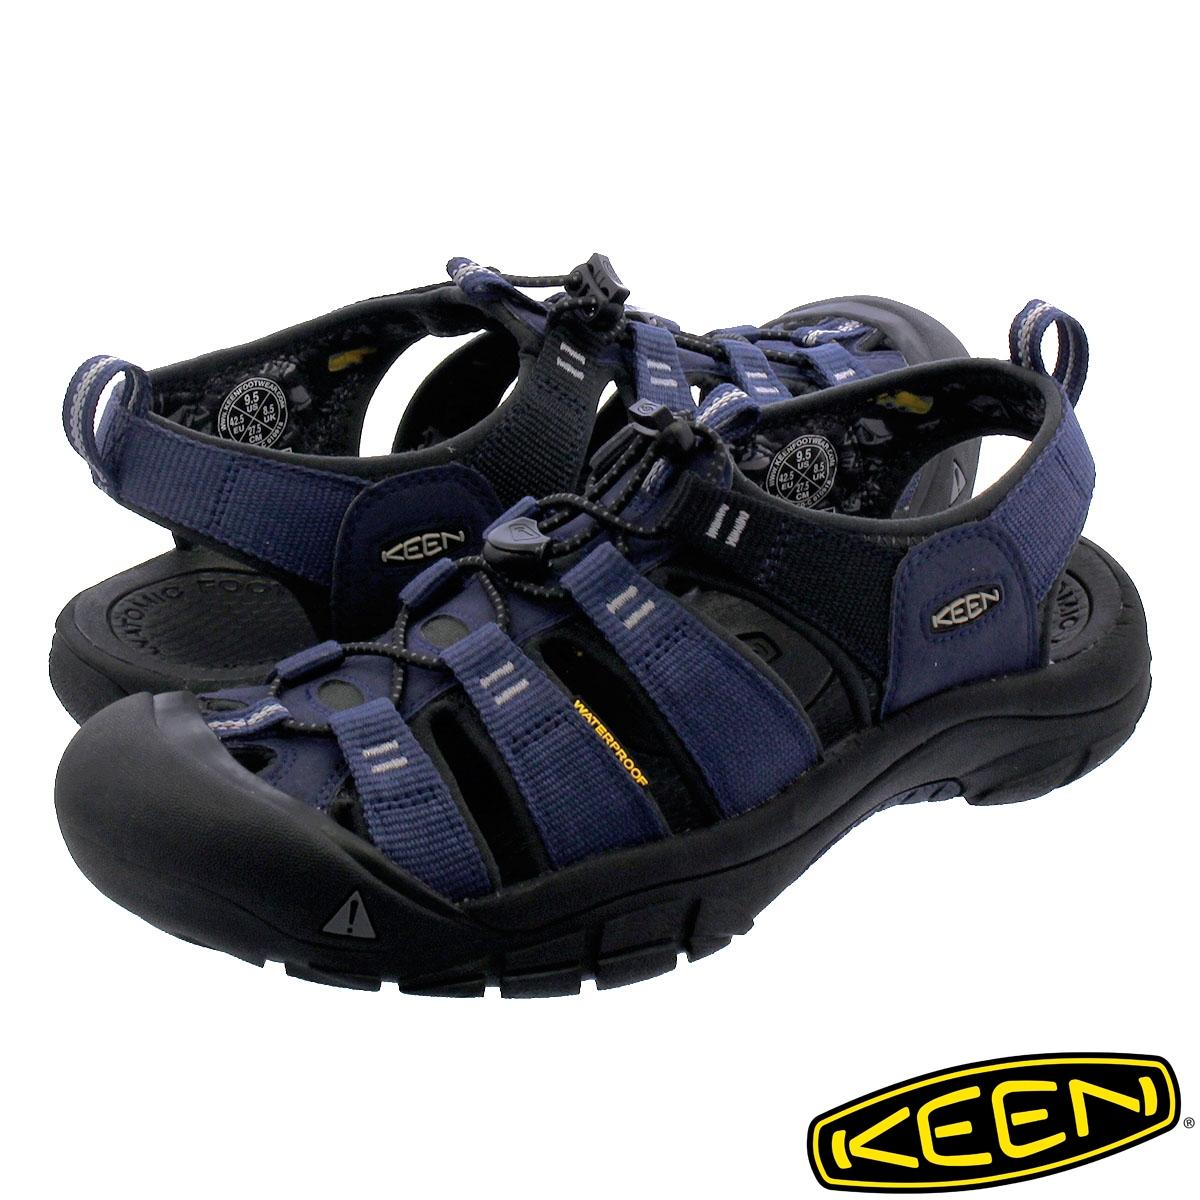 KEEN MEN NEWPORT H2 【メンズ】 キーン メン ニューポート H2 DRESS BLUES/STEEL GREY 1018940